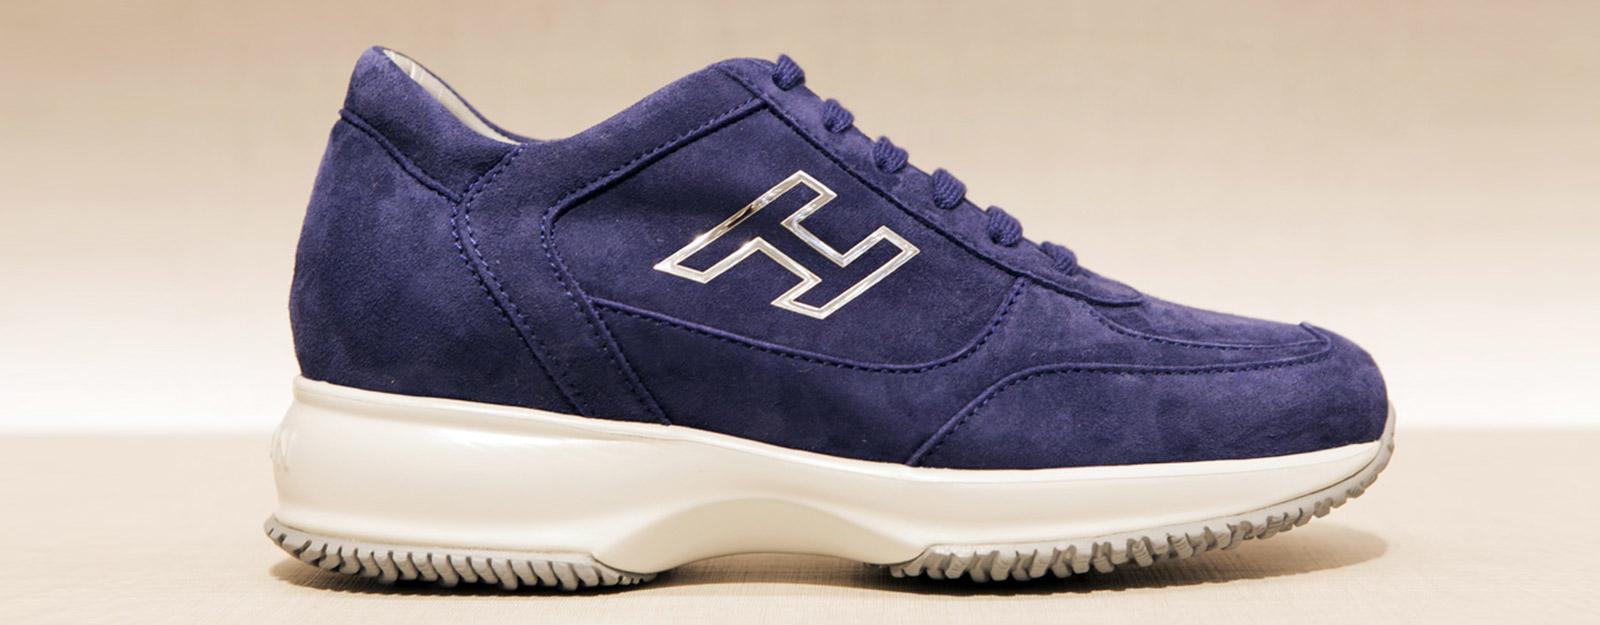 Napoli  producevano false scarpe Hogan a7ab4b6e605